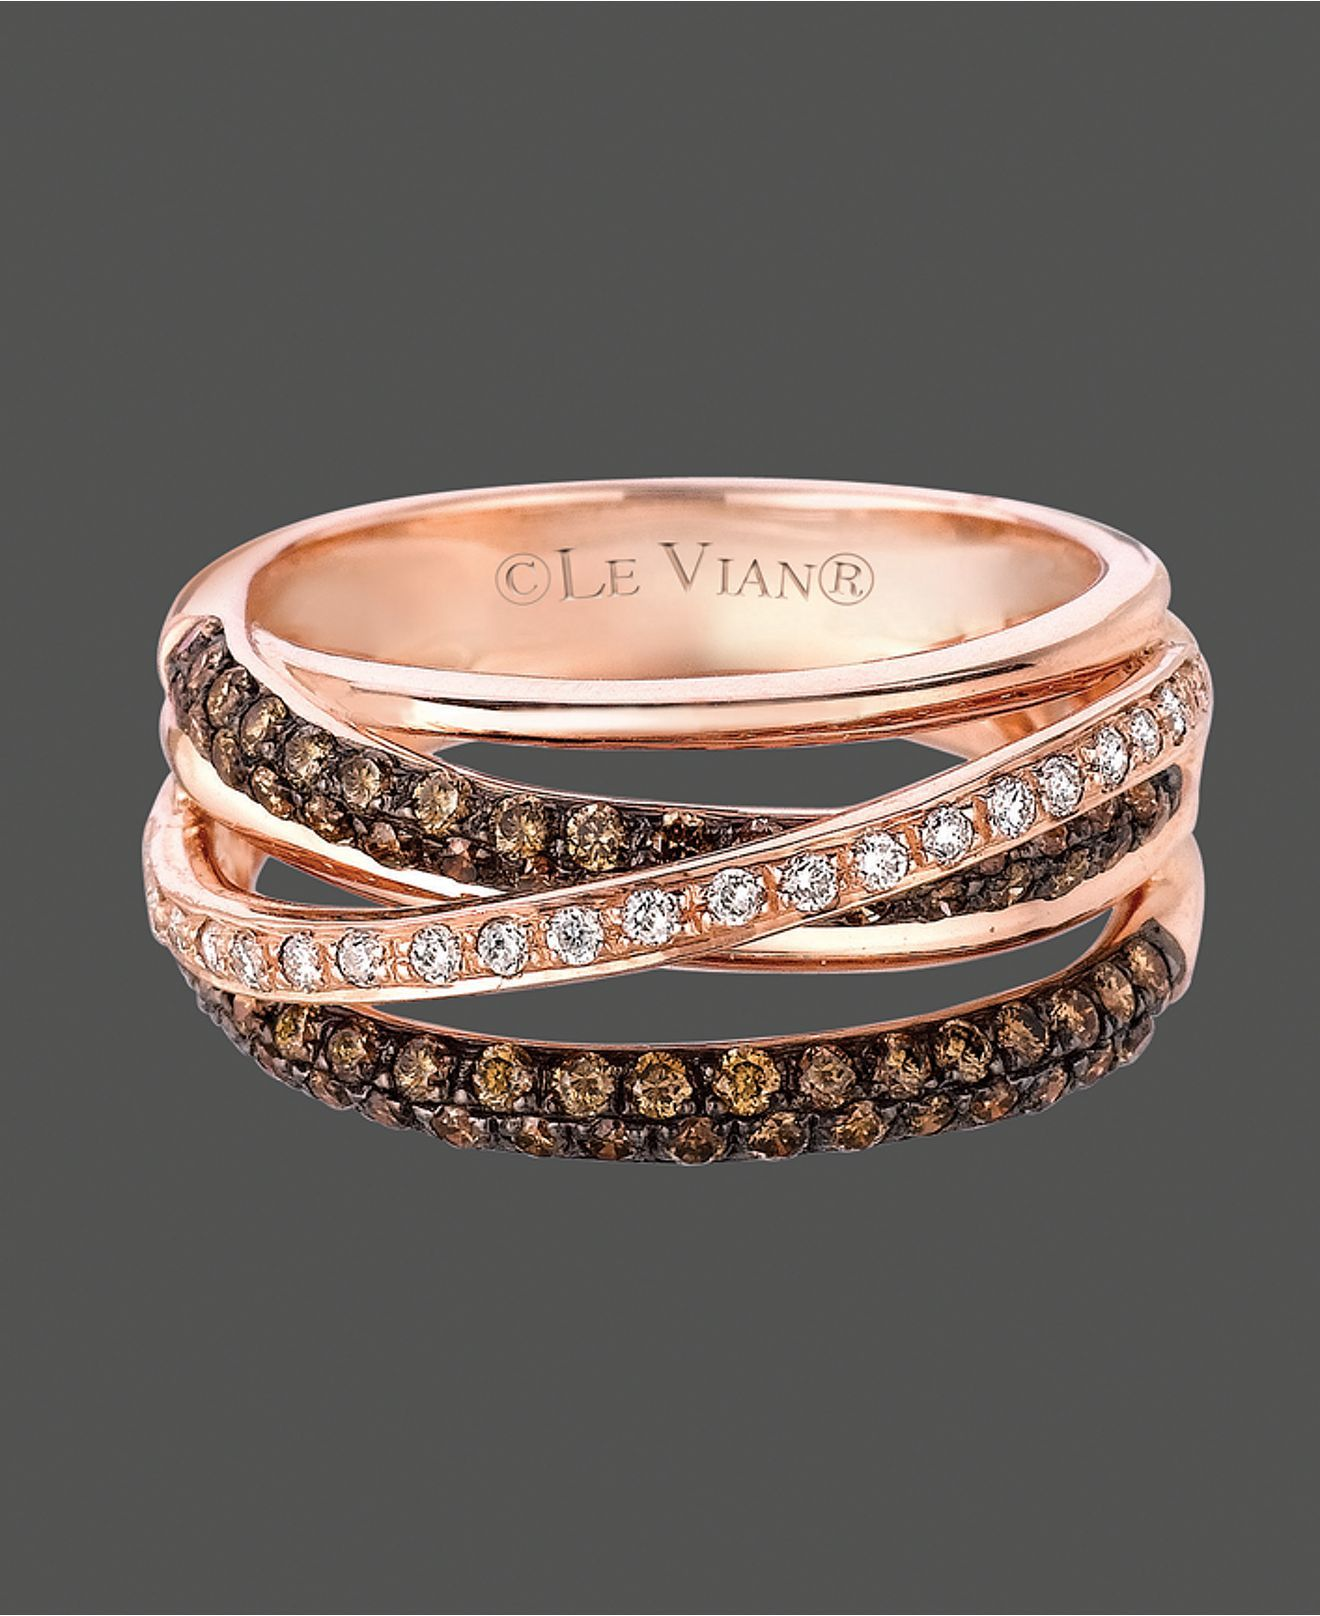 Le Vian Diamond Ring 14k Rose Gold White and Chocolate Diamond